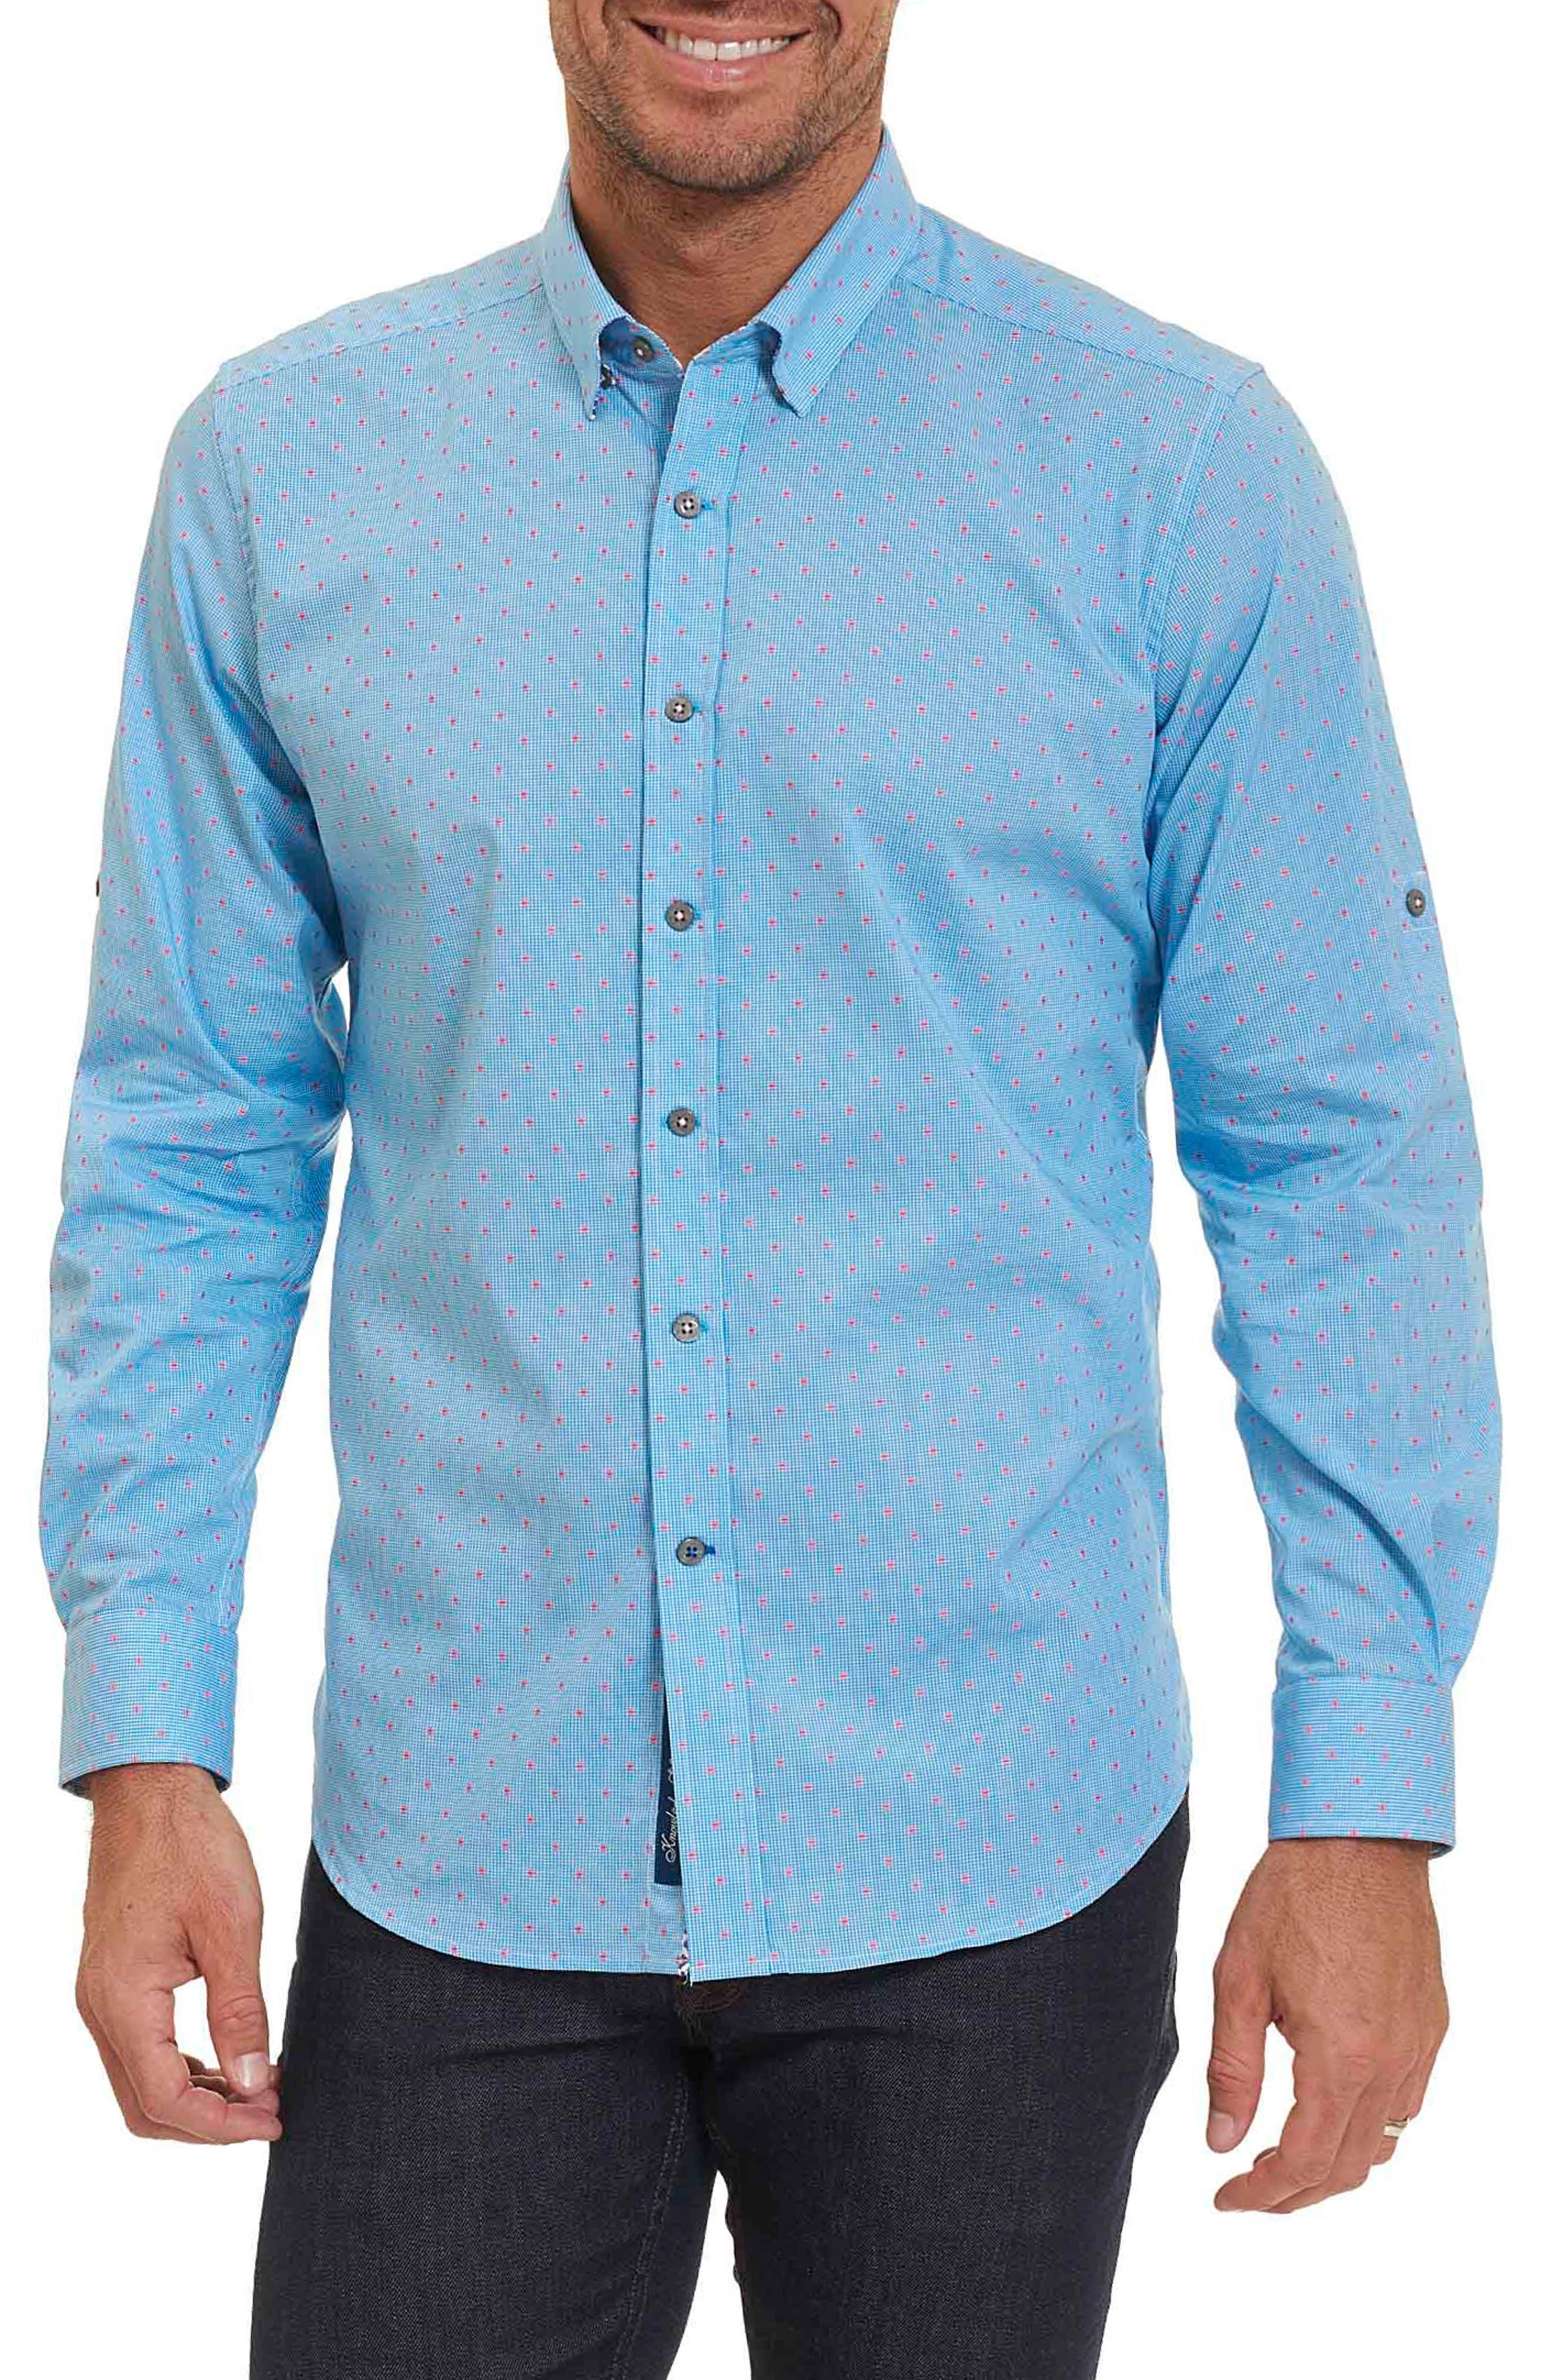 Main Image - Robert Graham Tailored Fit Houndstooth Sport Shirt